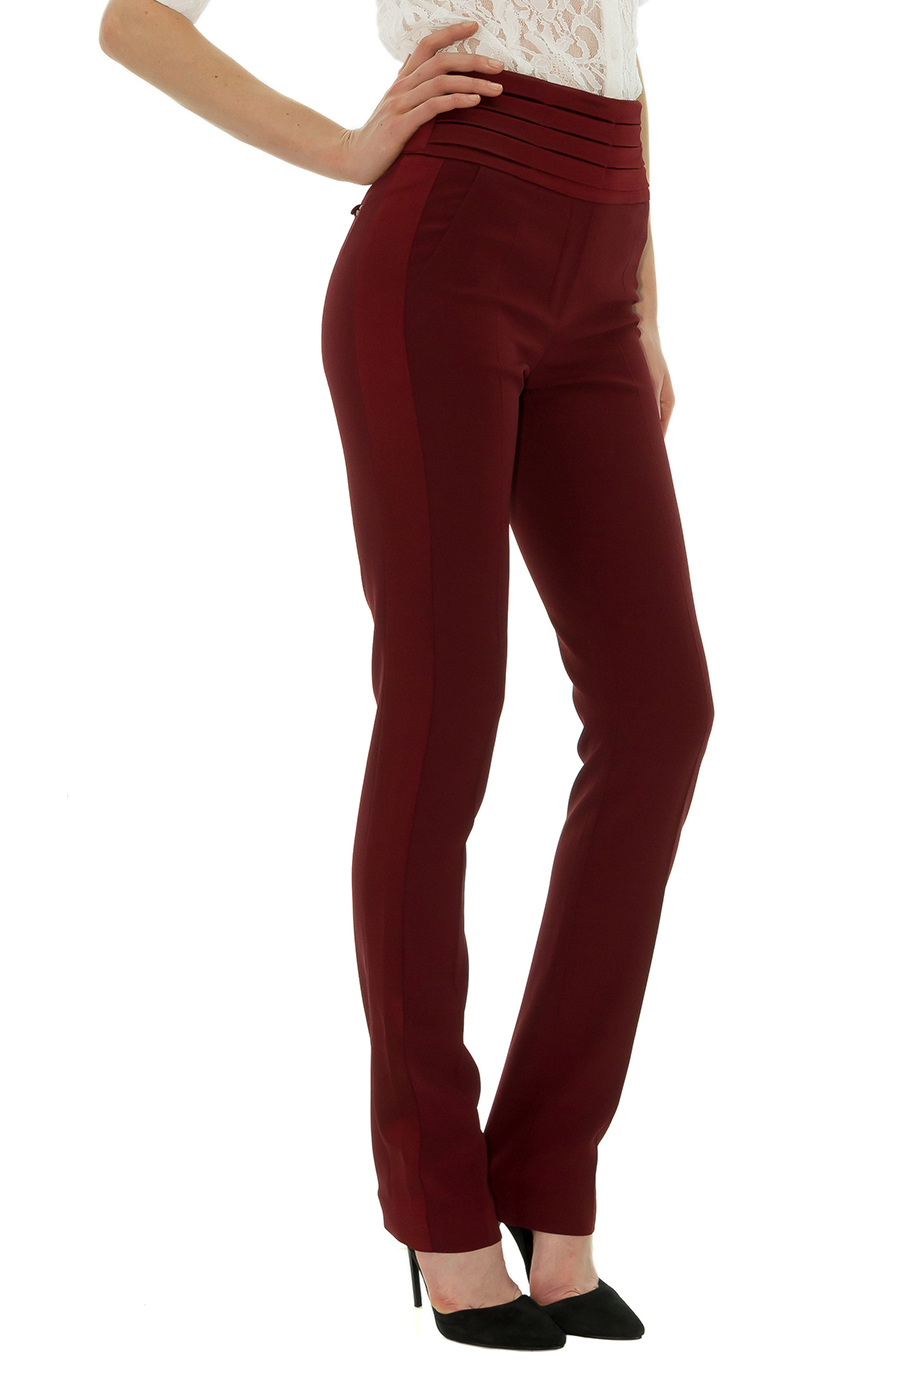 smoking femme pantalon taille haute smoking rouge tanya chubko stefanie renoma. Black Bedroom Furniture Sets. Home Design Ideas